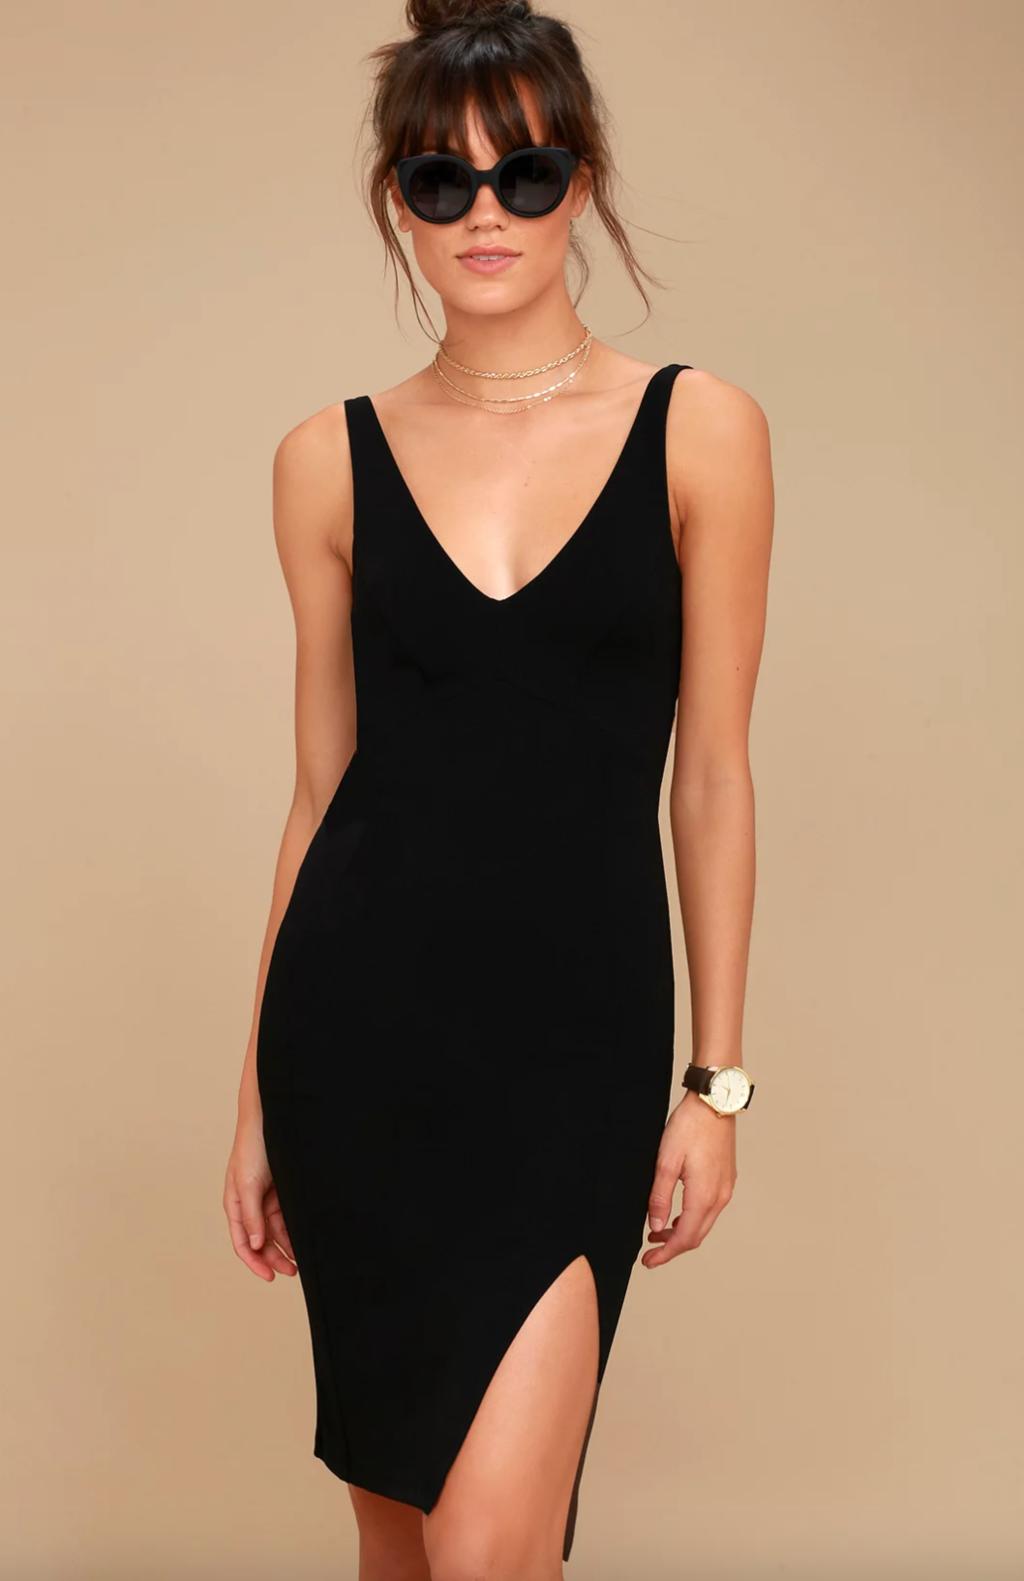 Chic black dress from Lulu's